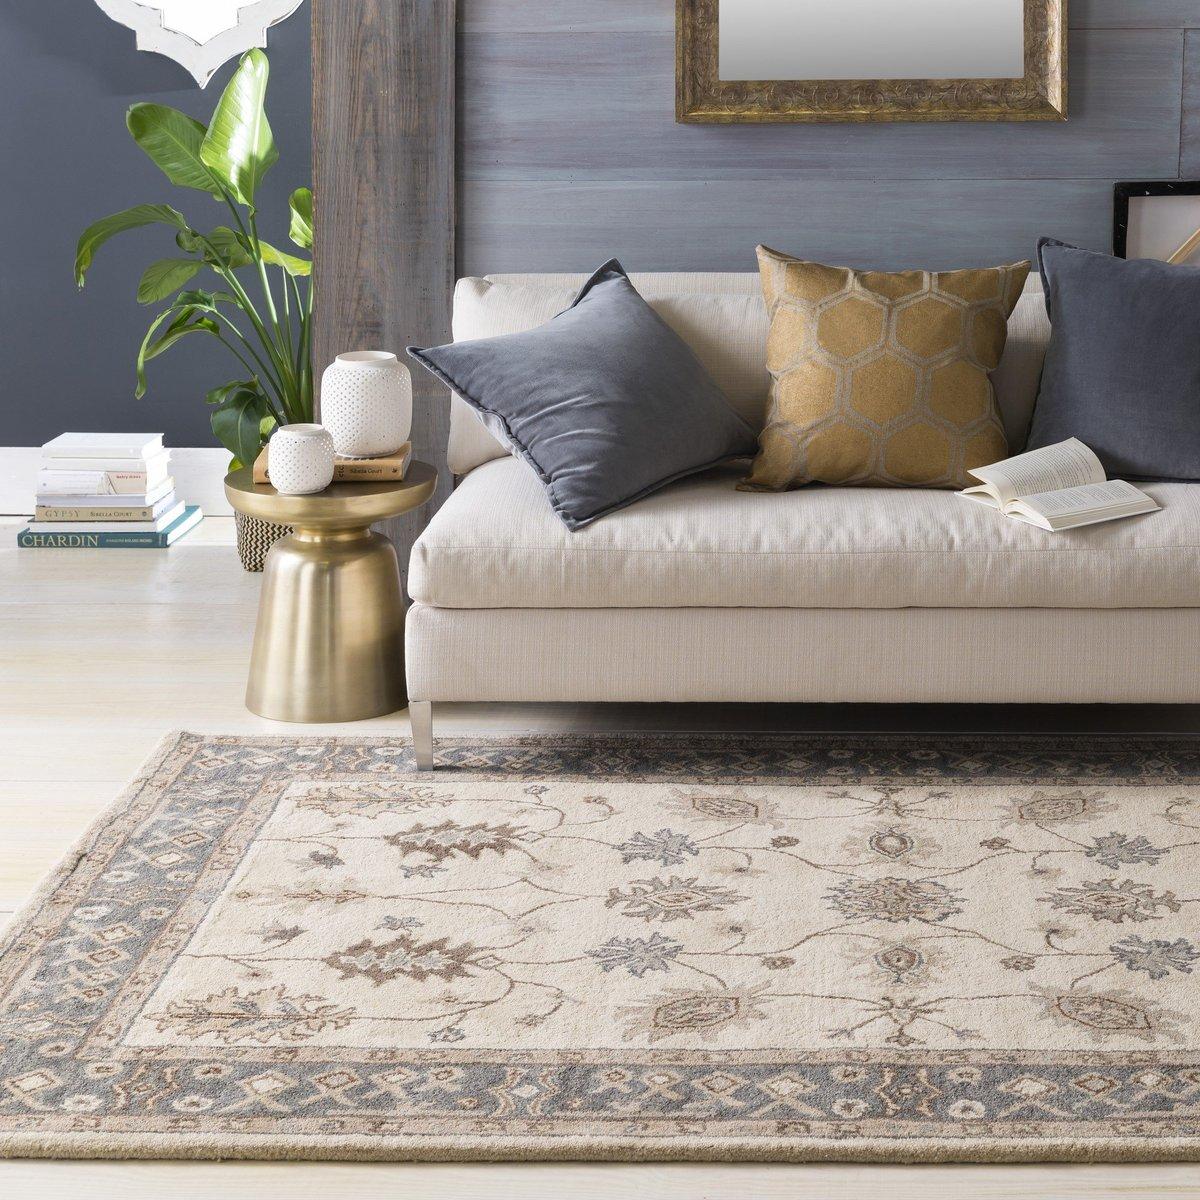 Gold Glam + Grey Living Room Ideas